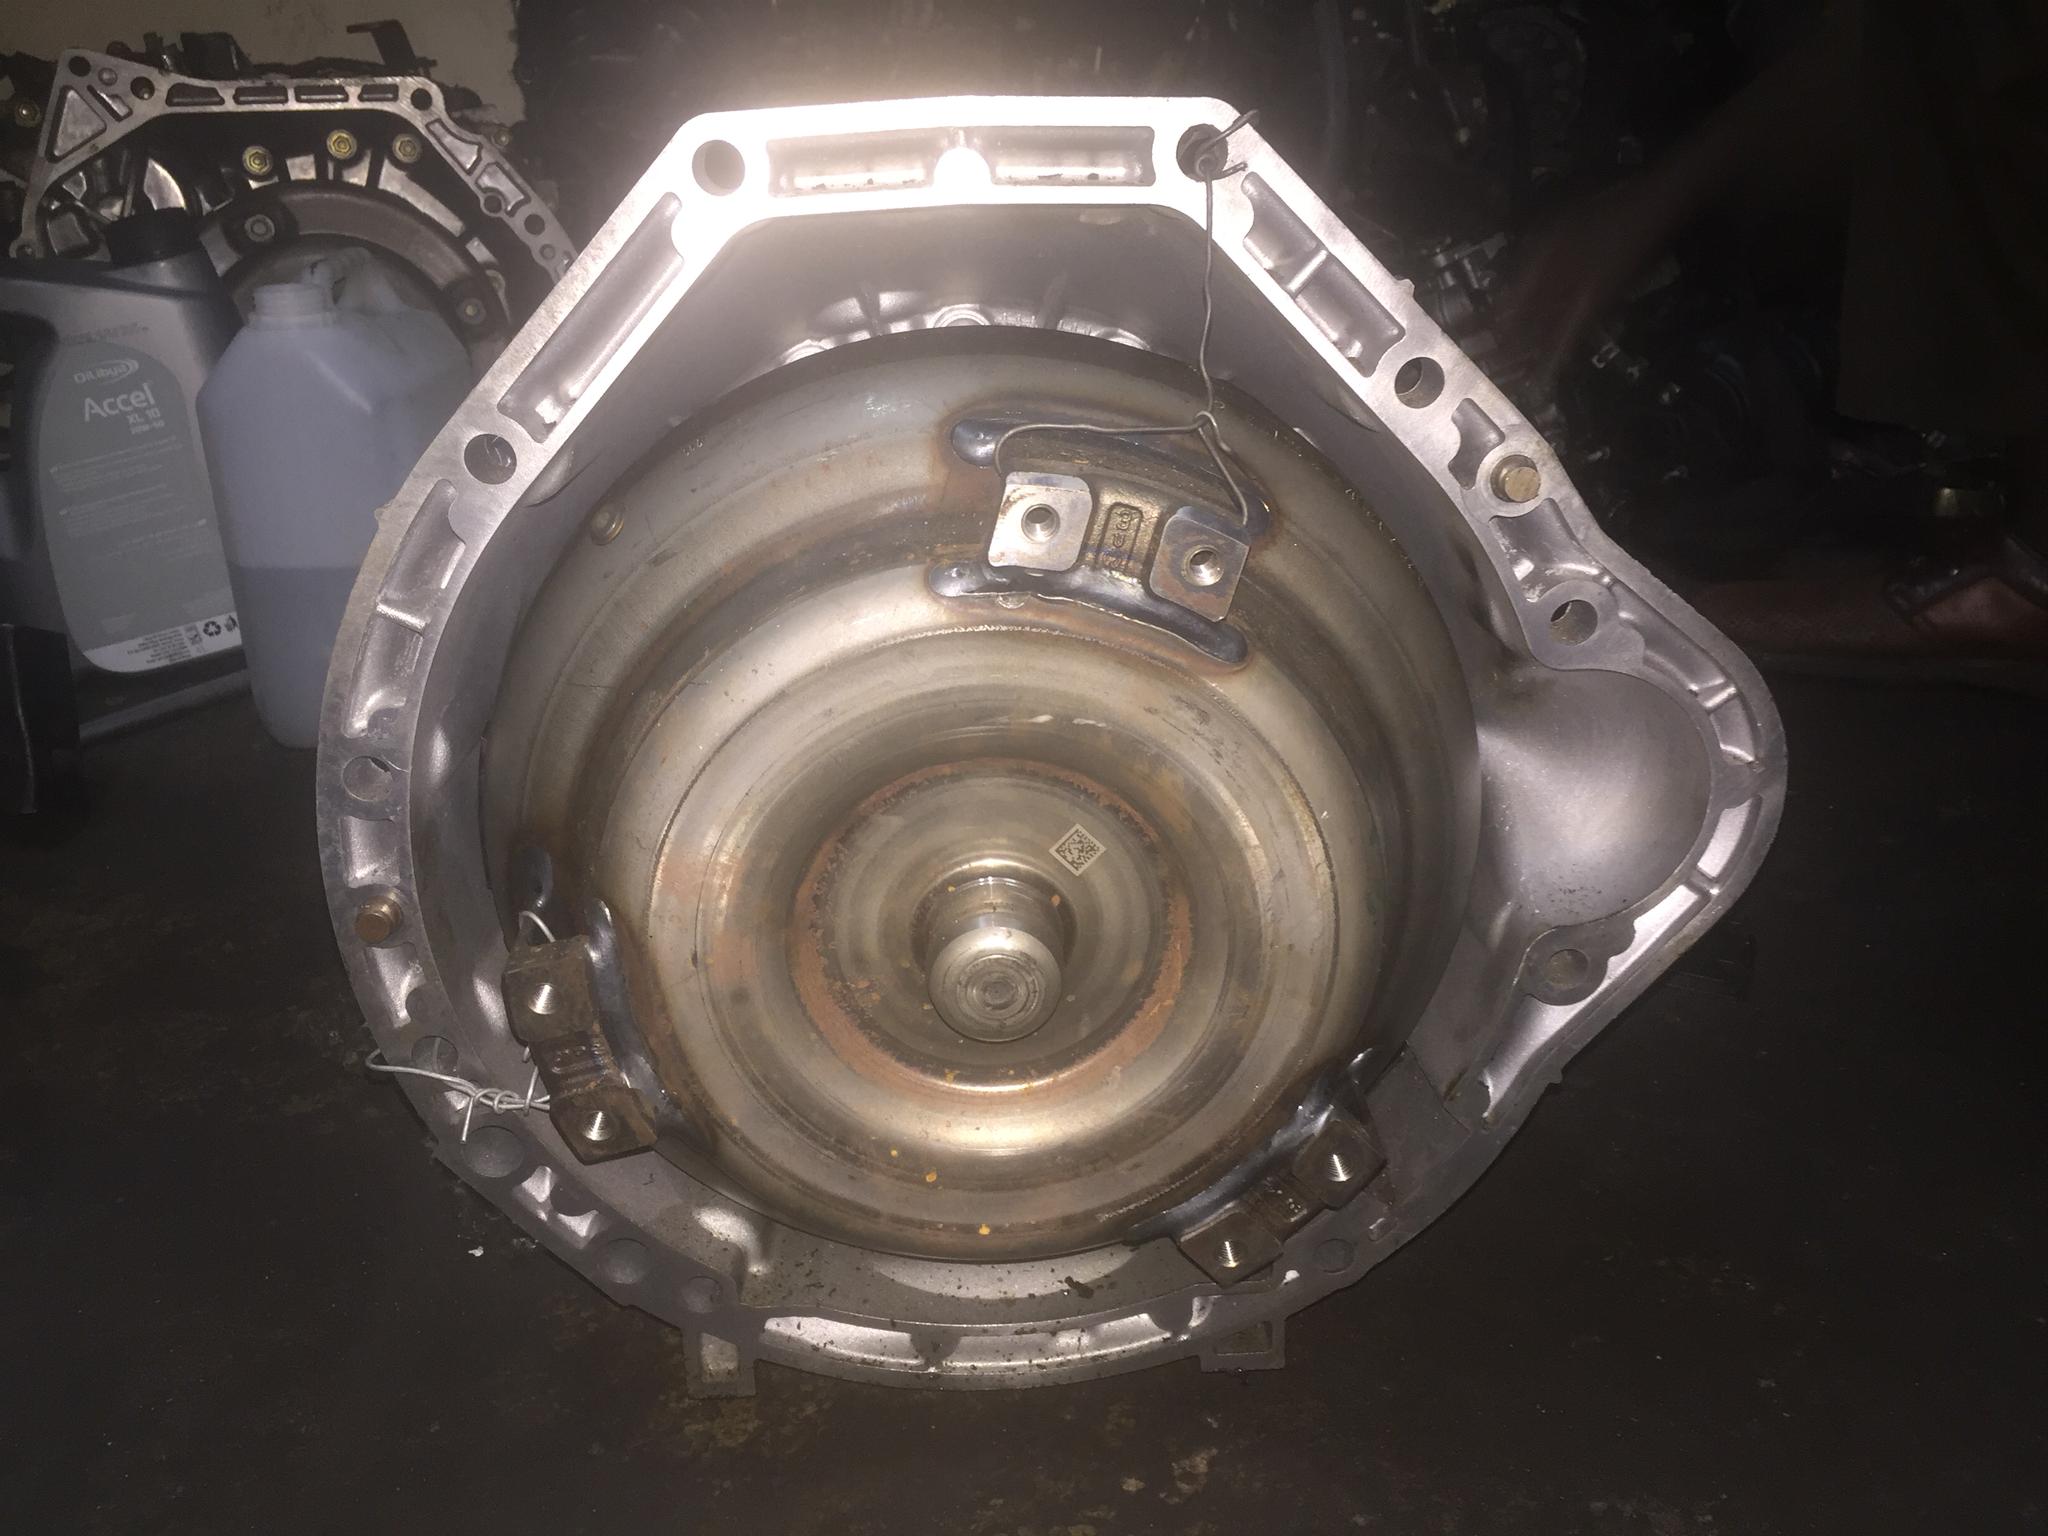 CGI Mercedes Benz gear box